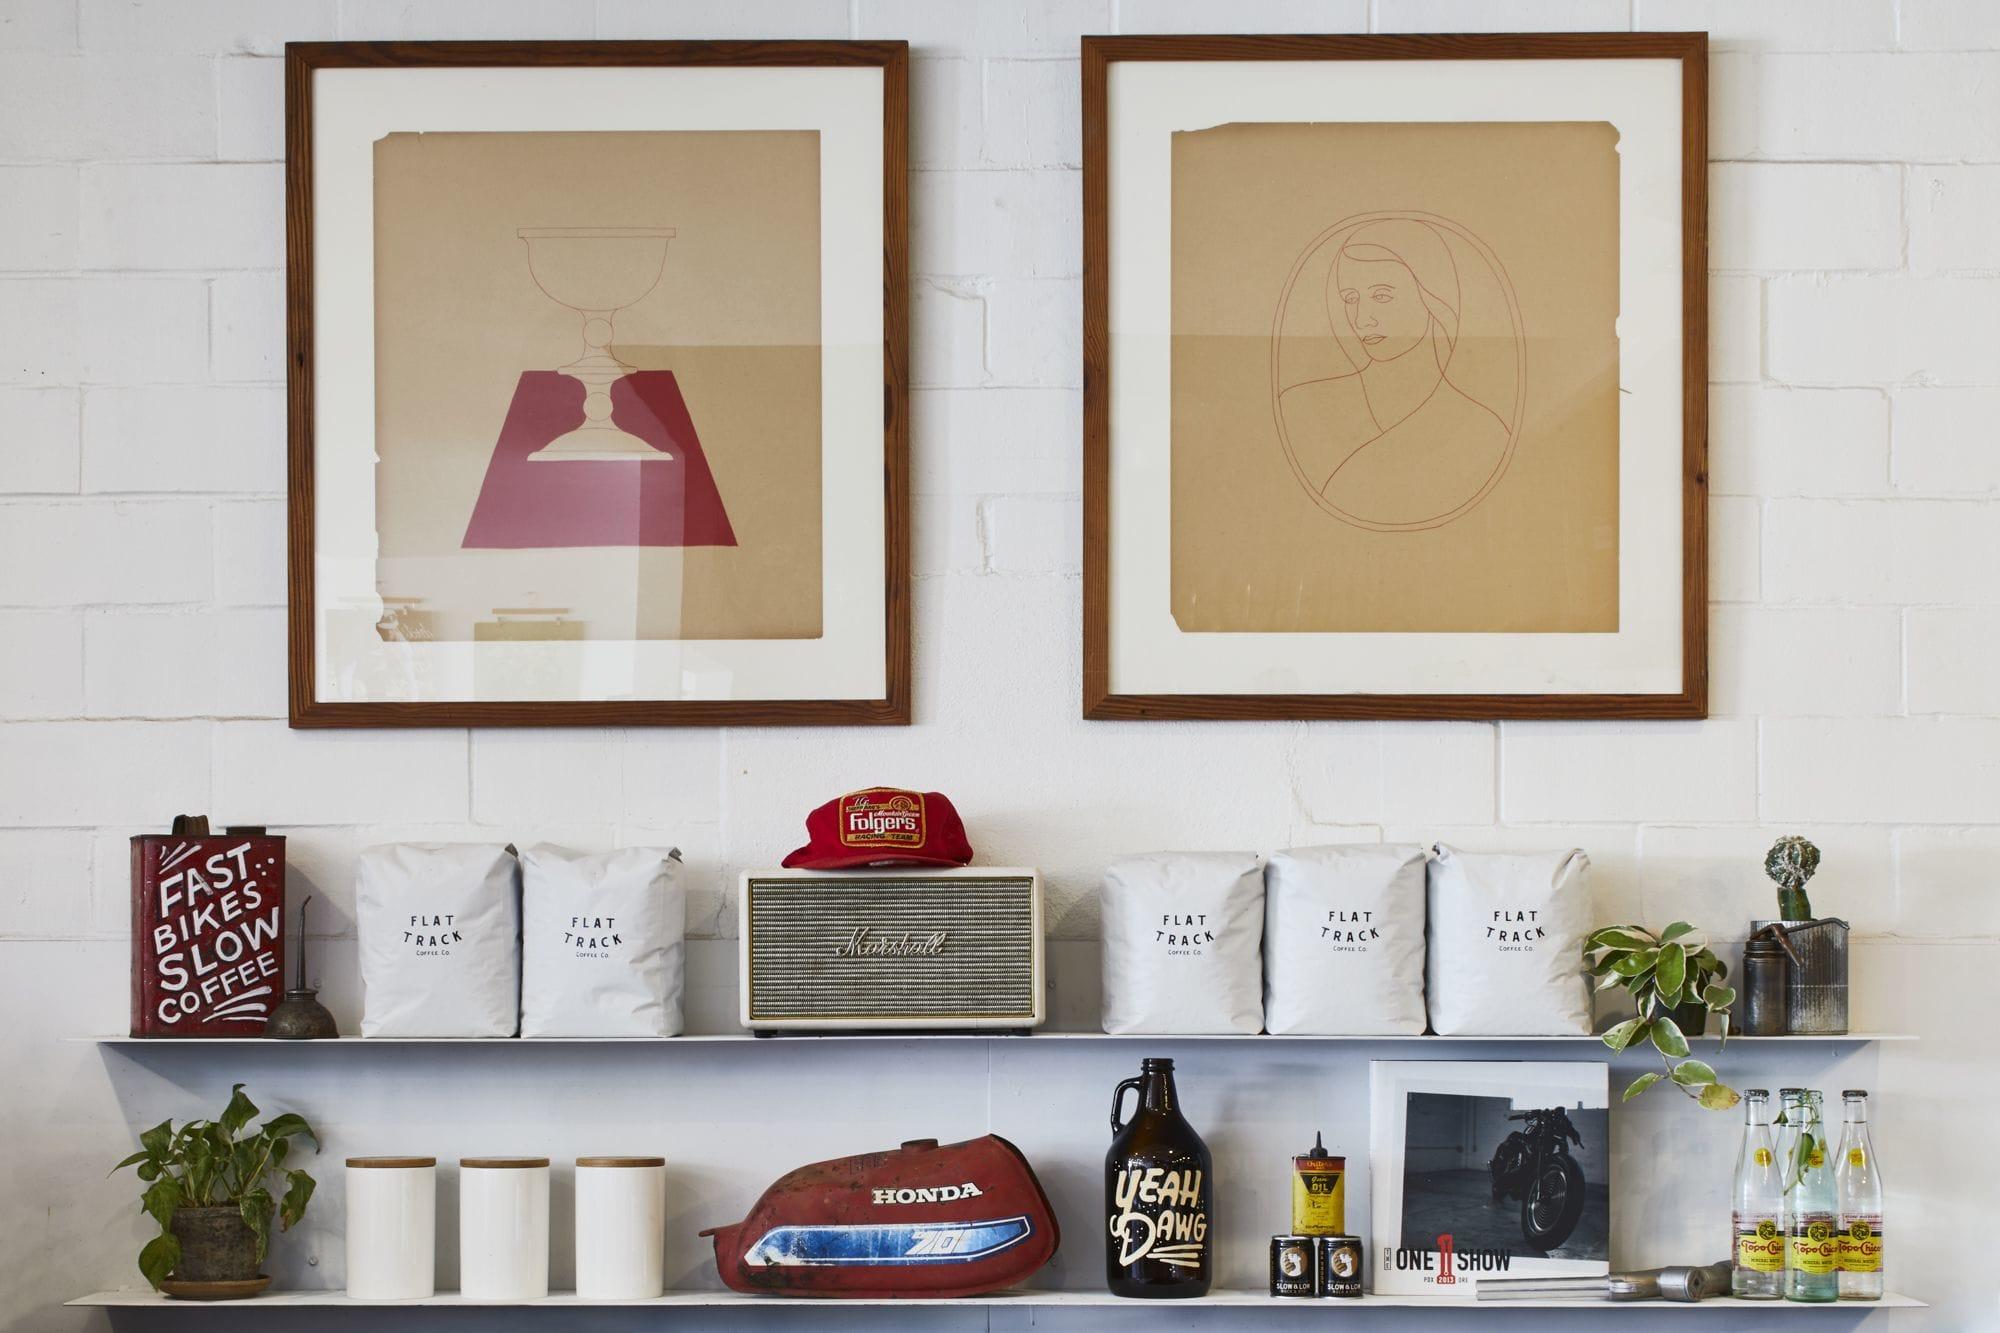 Lighting Design by Lilianne Steckel Interior Design seen at Flat Track Coffee, Austin - Flat Track Coffee